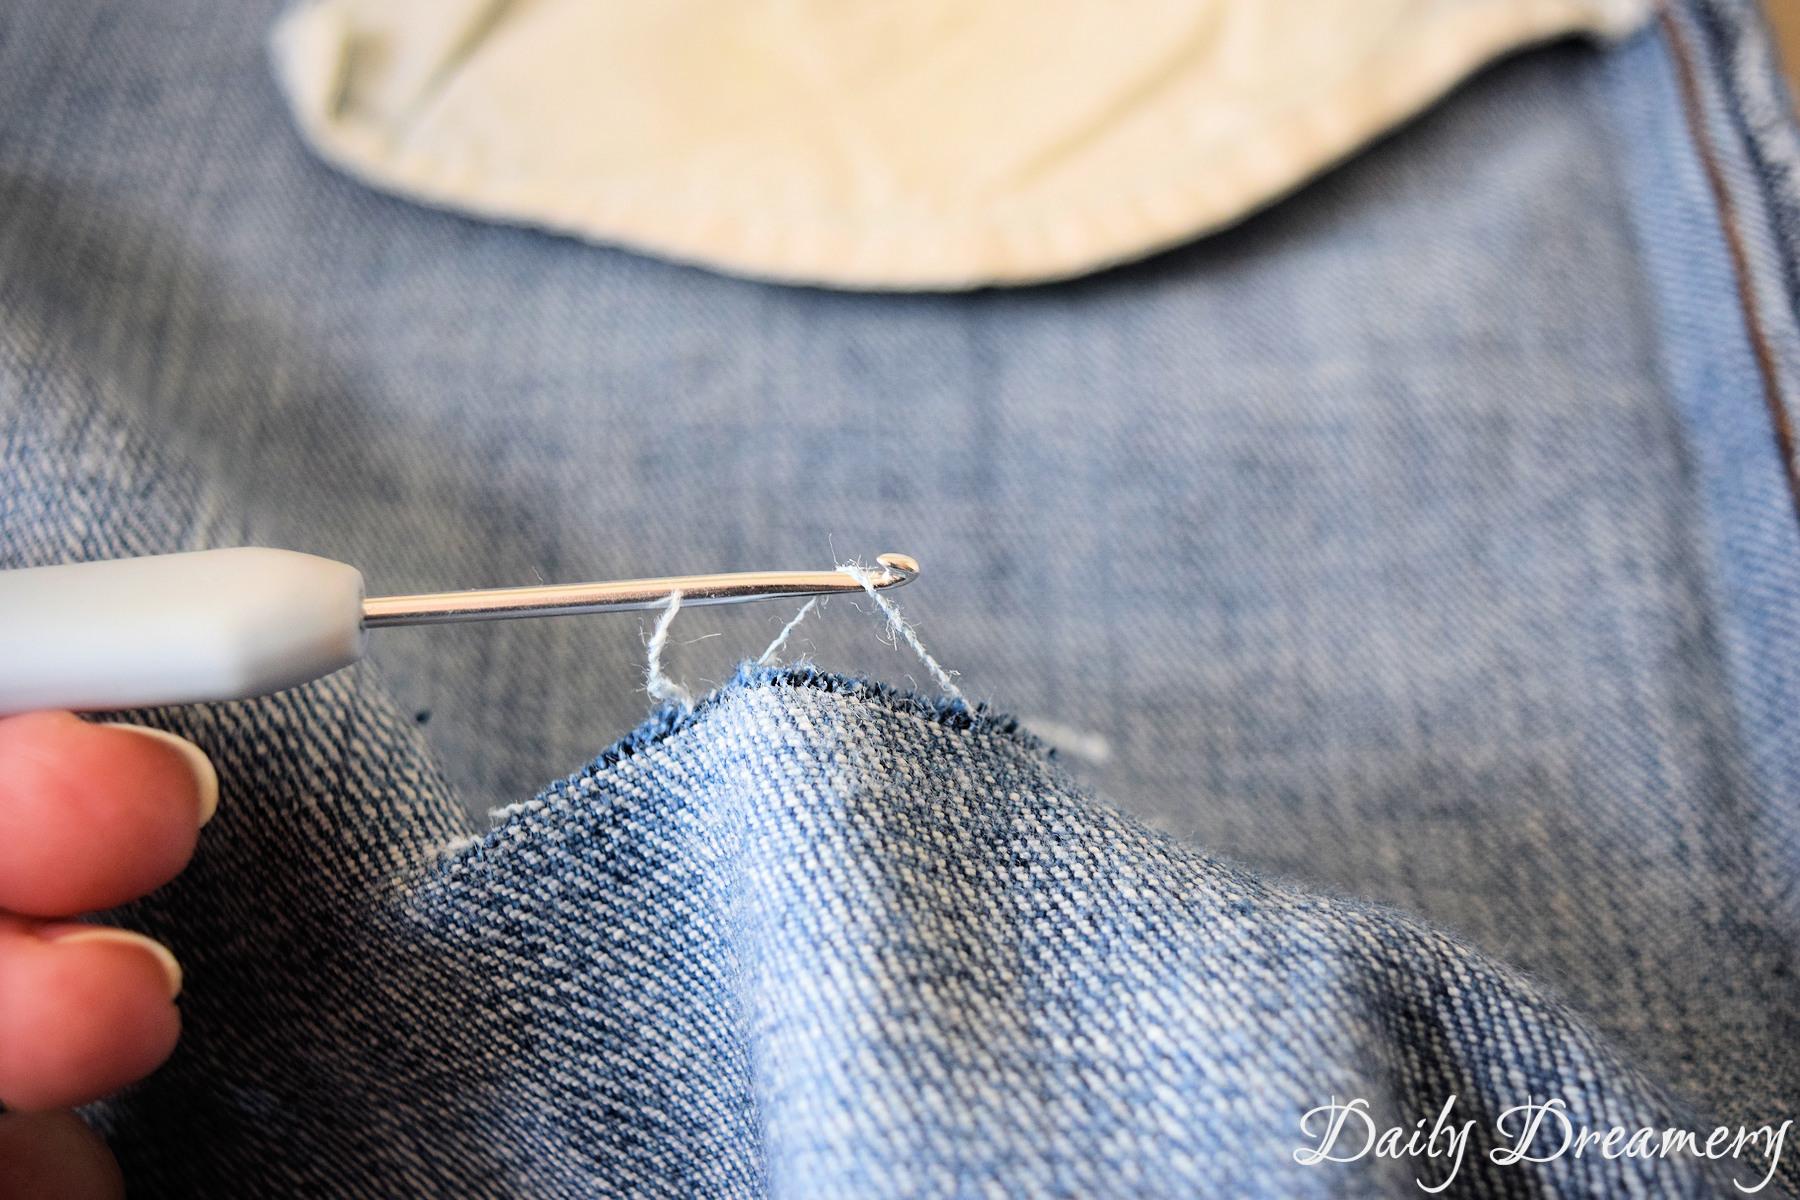 Etwas Neues genug Sommertrend Ripped Jeans - ganz easy selbermachen – Daily Dreamery &SU_03